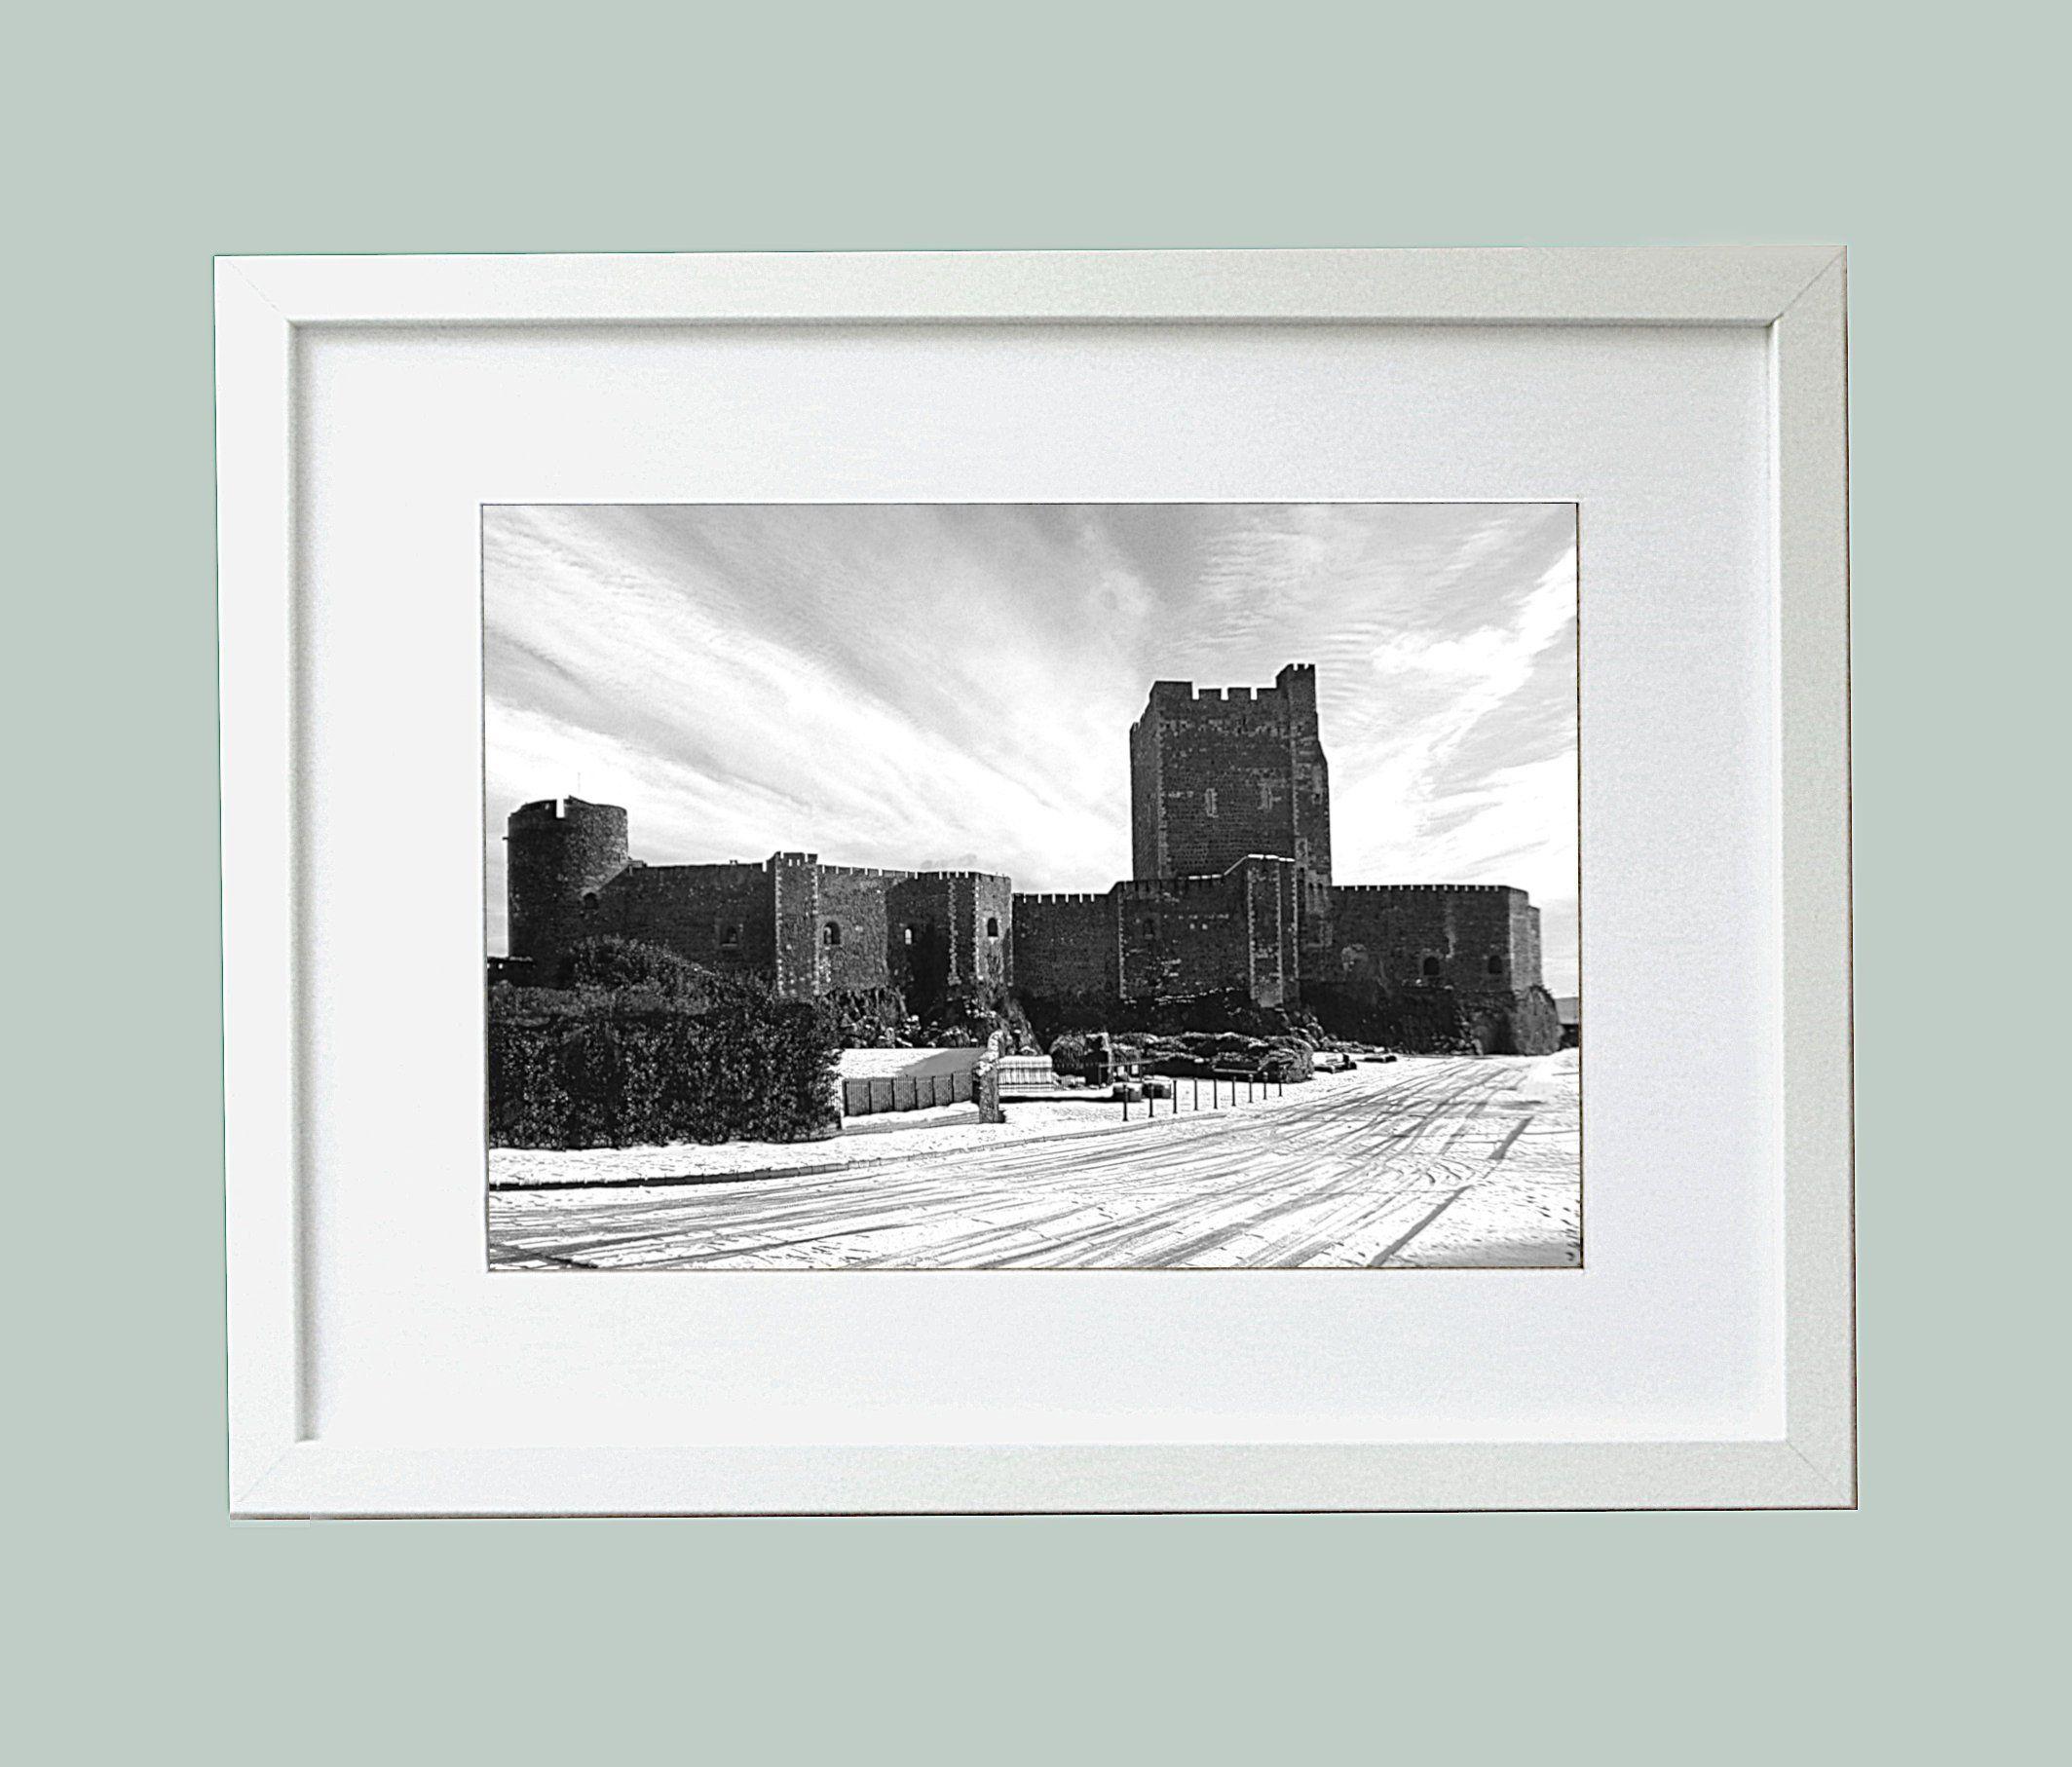 Monochrome photo carrickfergus castle fine art print county antrim from ireland by irishbarnvintage on etsy